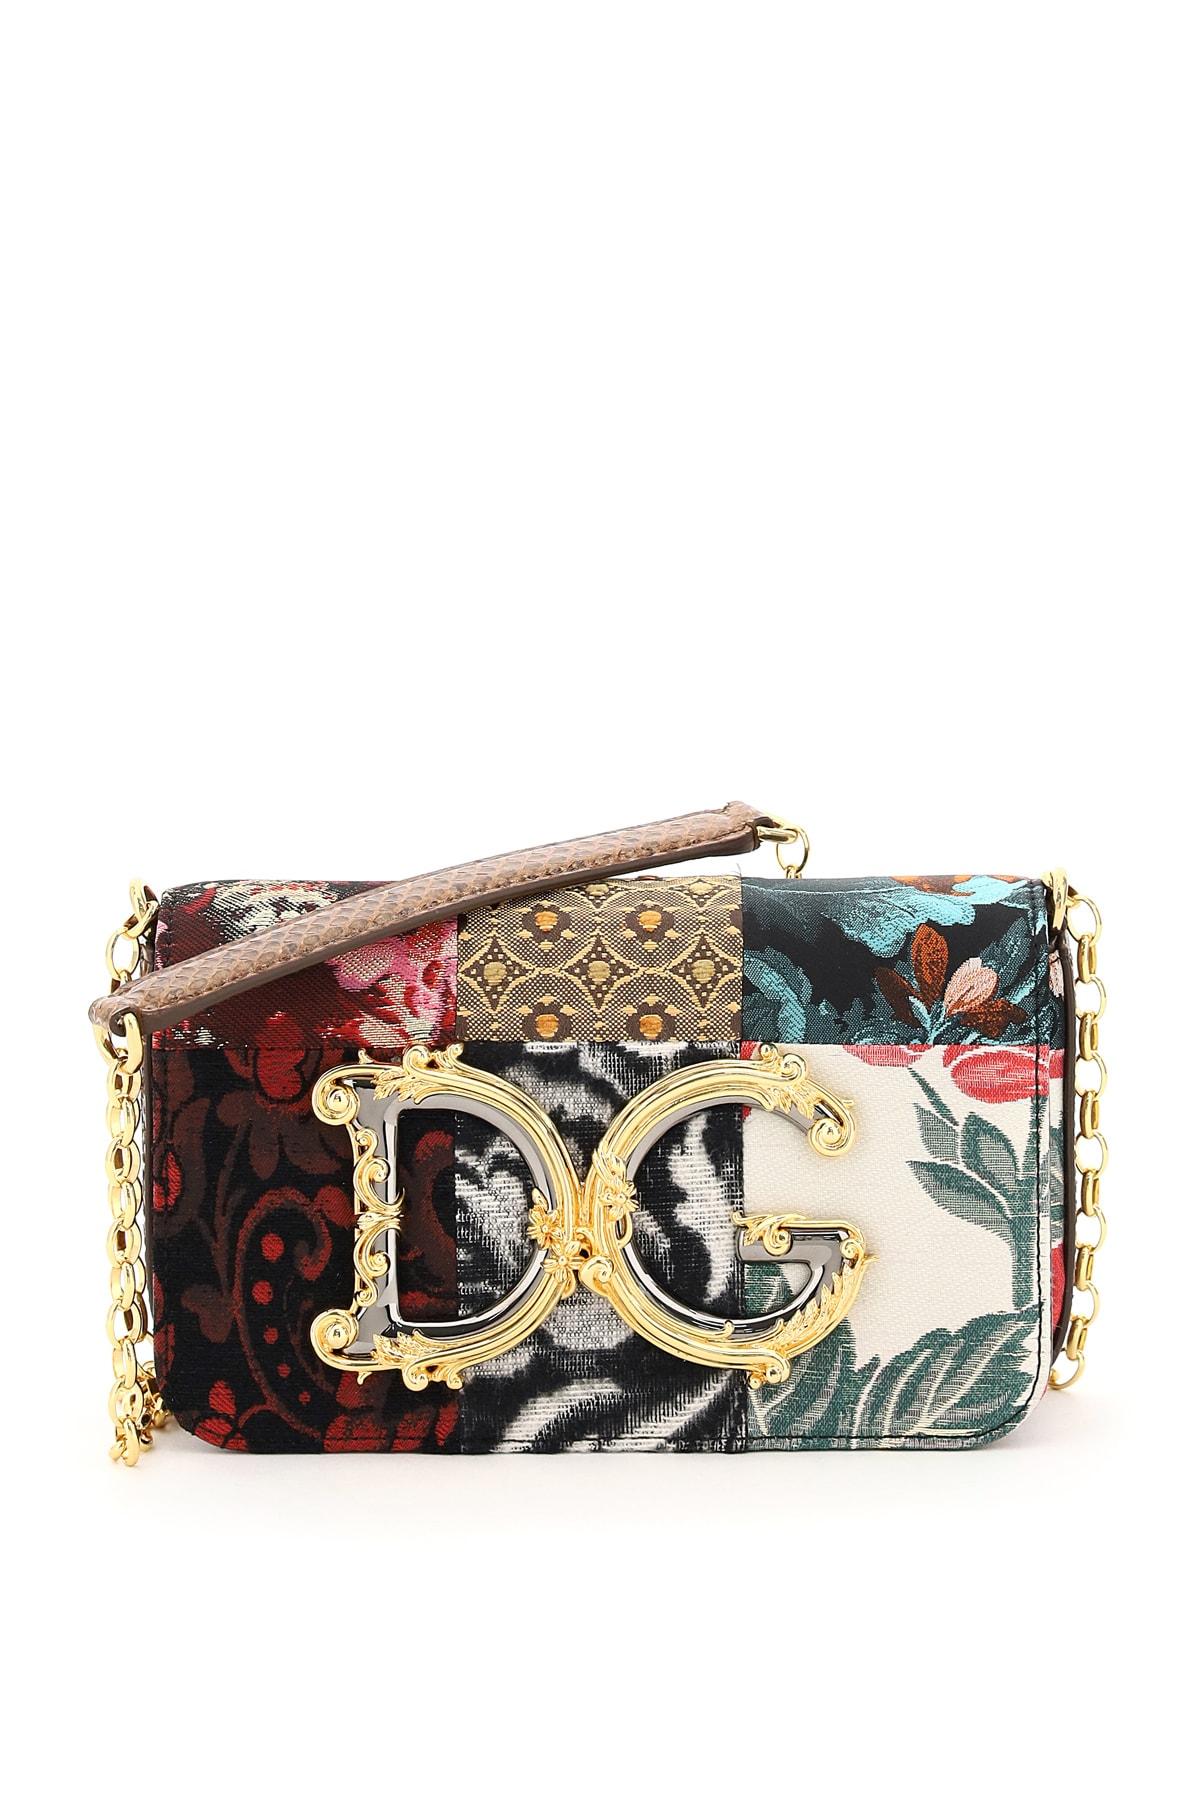 Dolce & Gabbana Patchwork Dg Girls Barocco Mini Bag